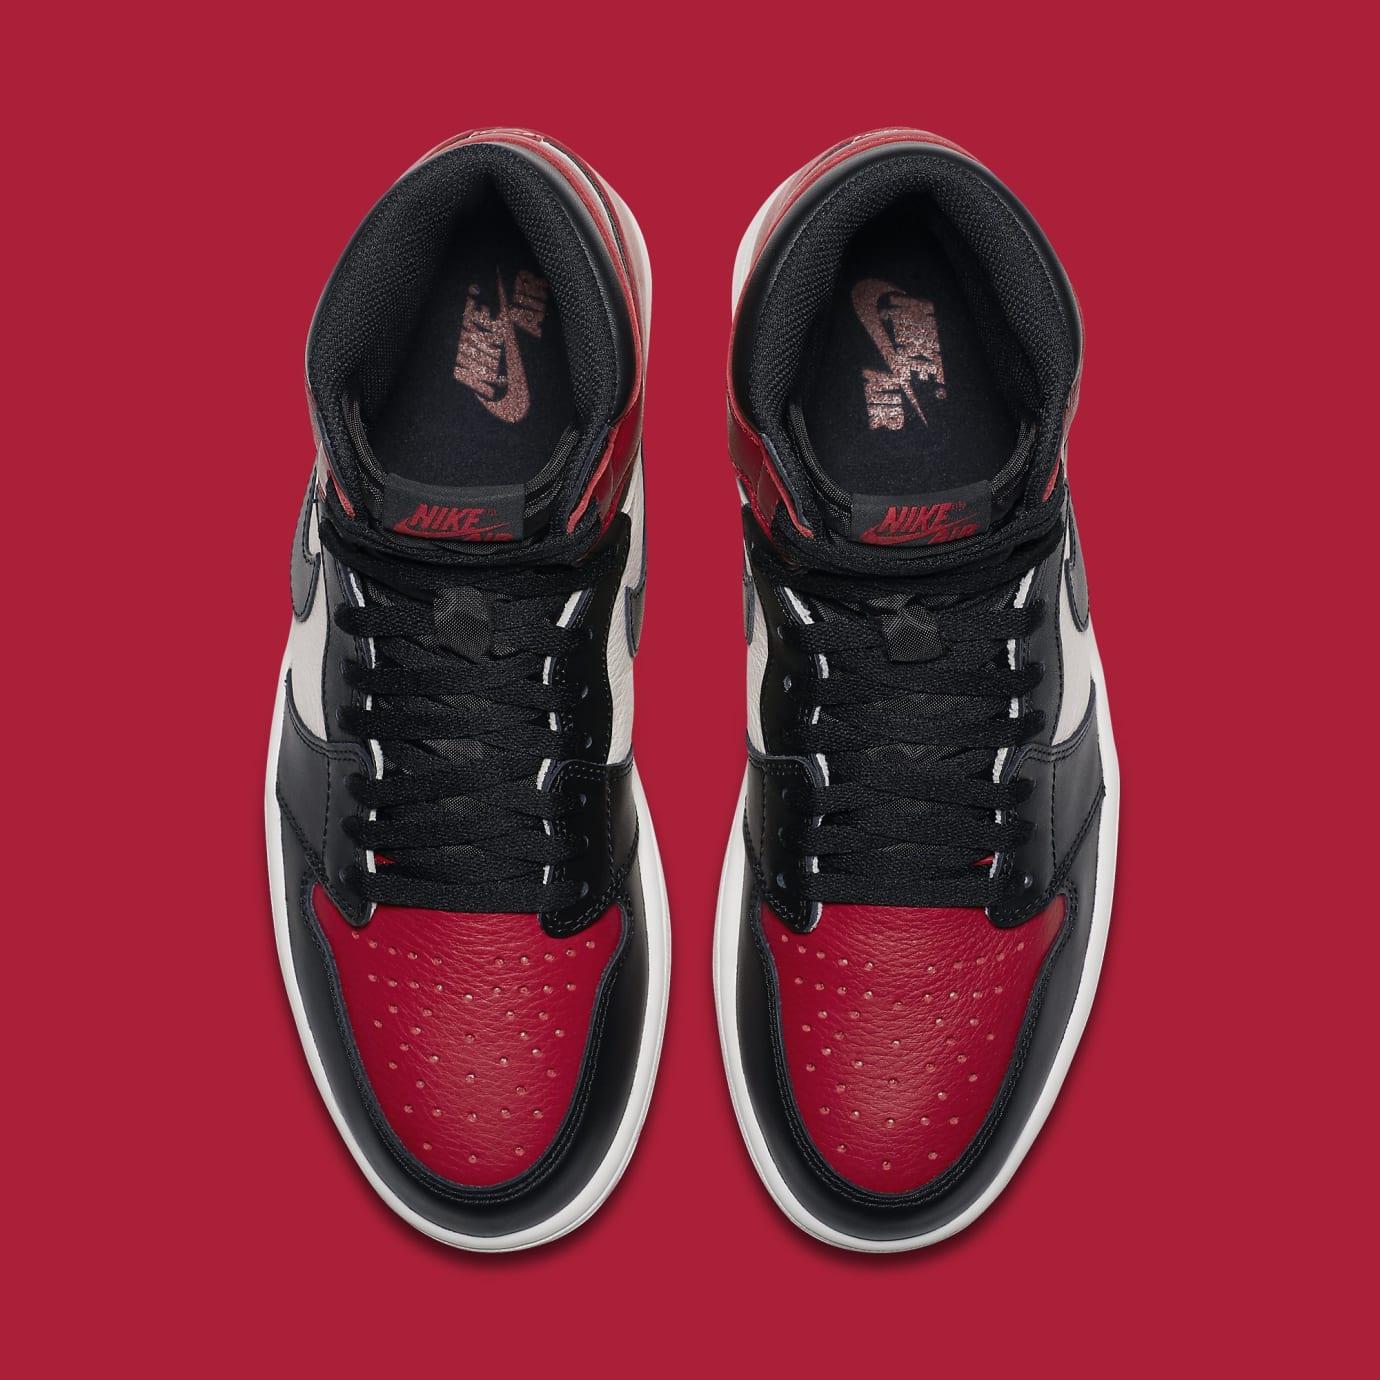 2af477d551d Image via Nike Air Jordan 1  Bred Toe  Gym Red Black-Summit White 555088-